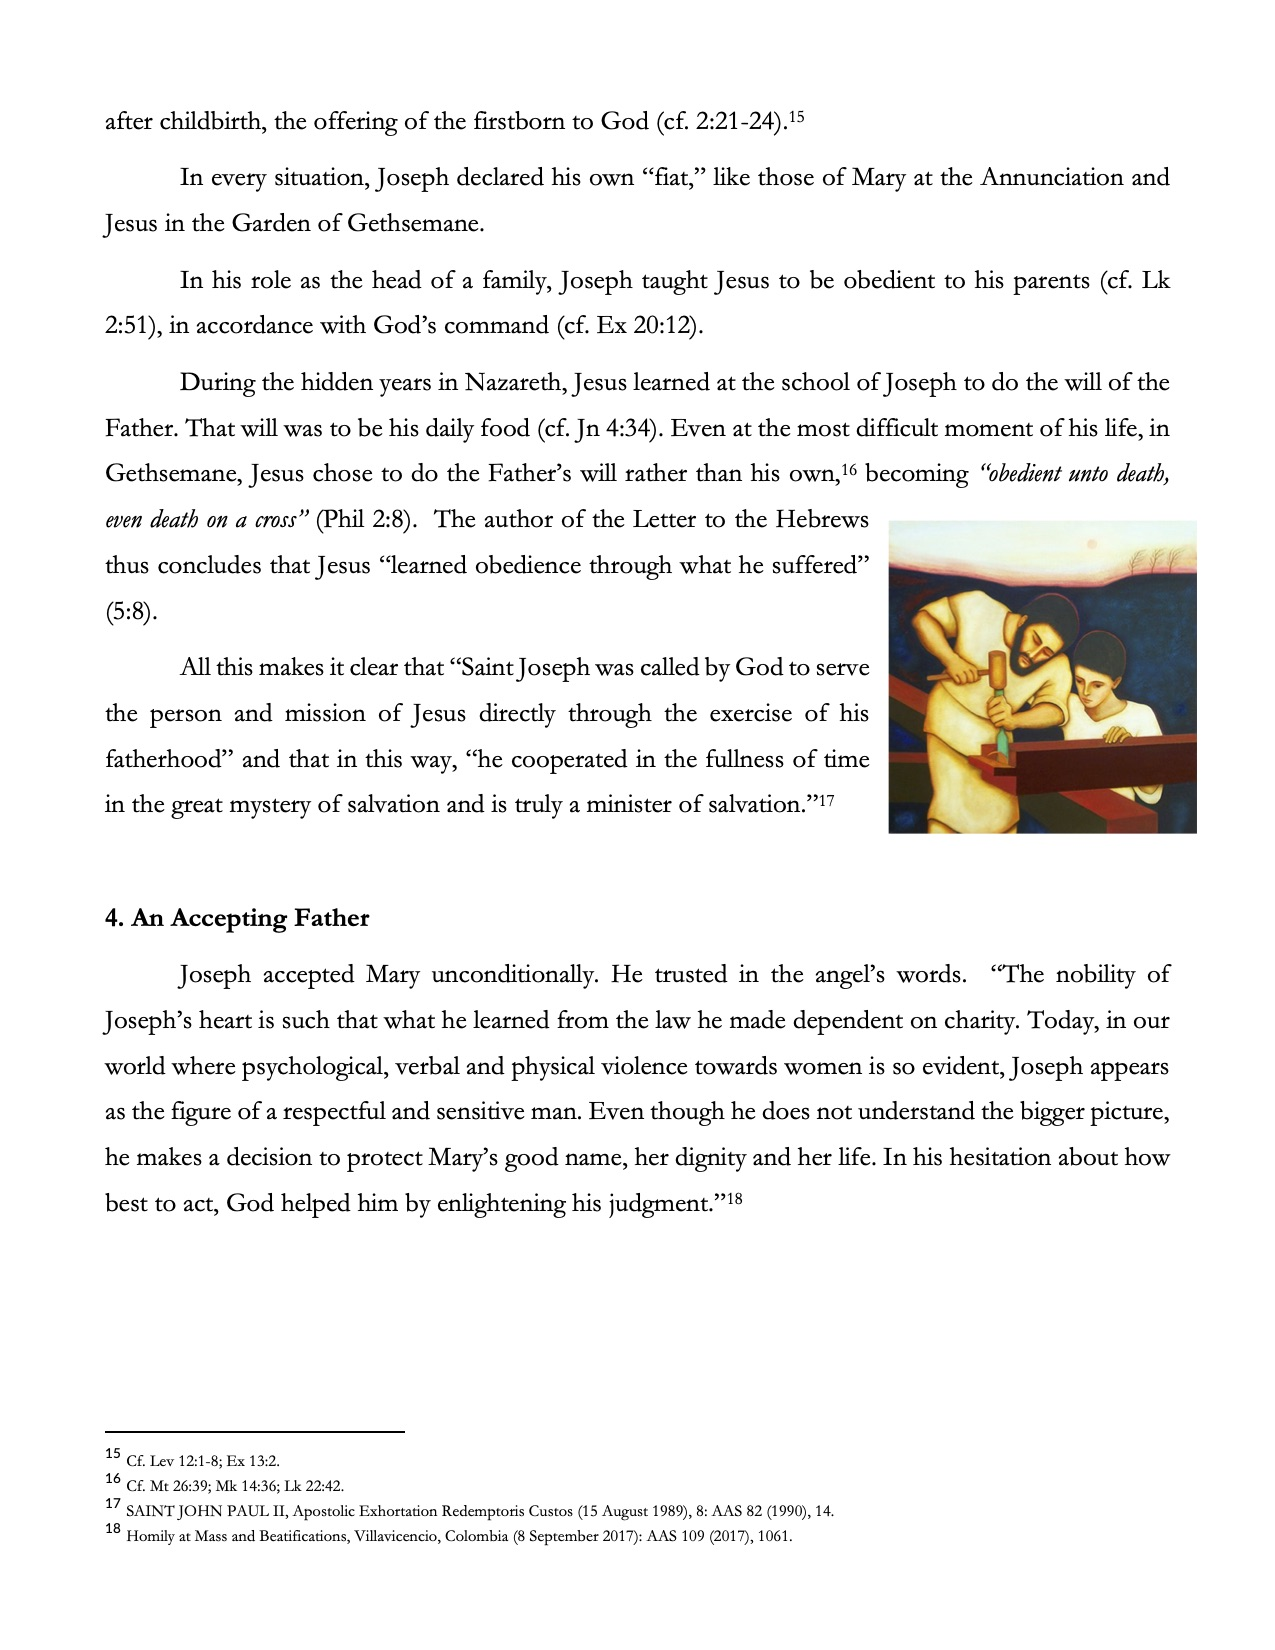 07-APOSTOLIC LETTER